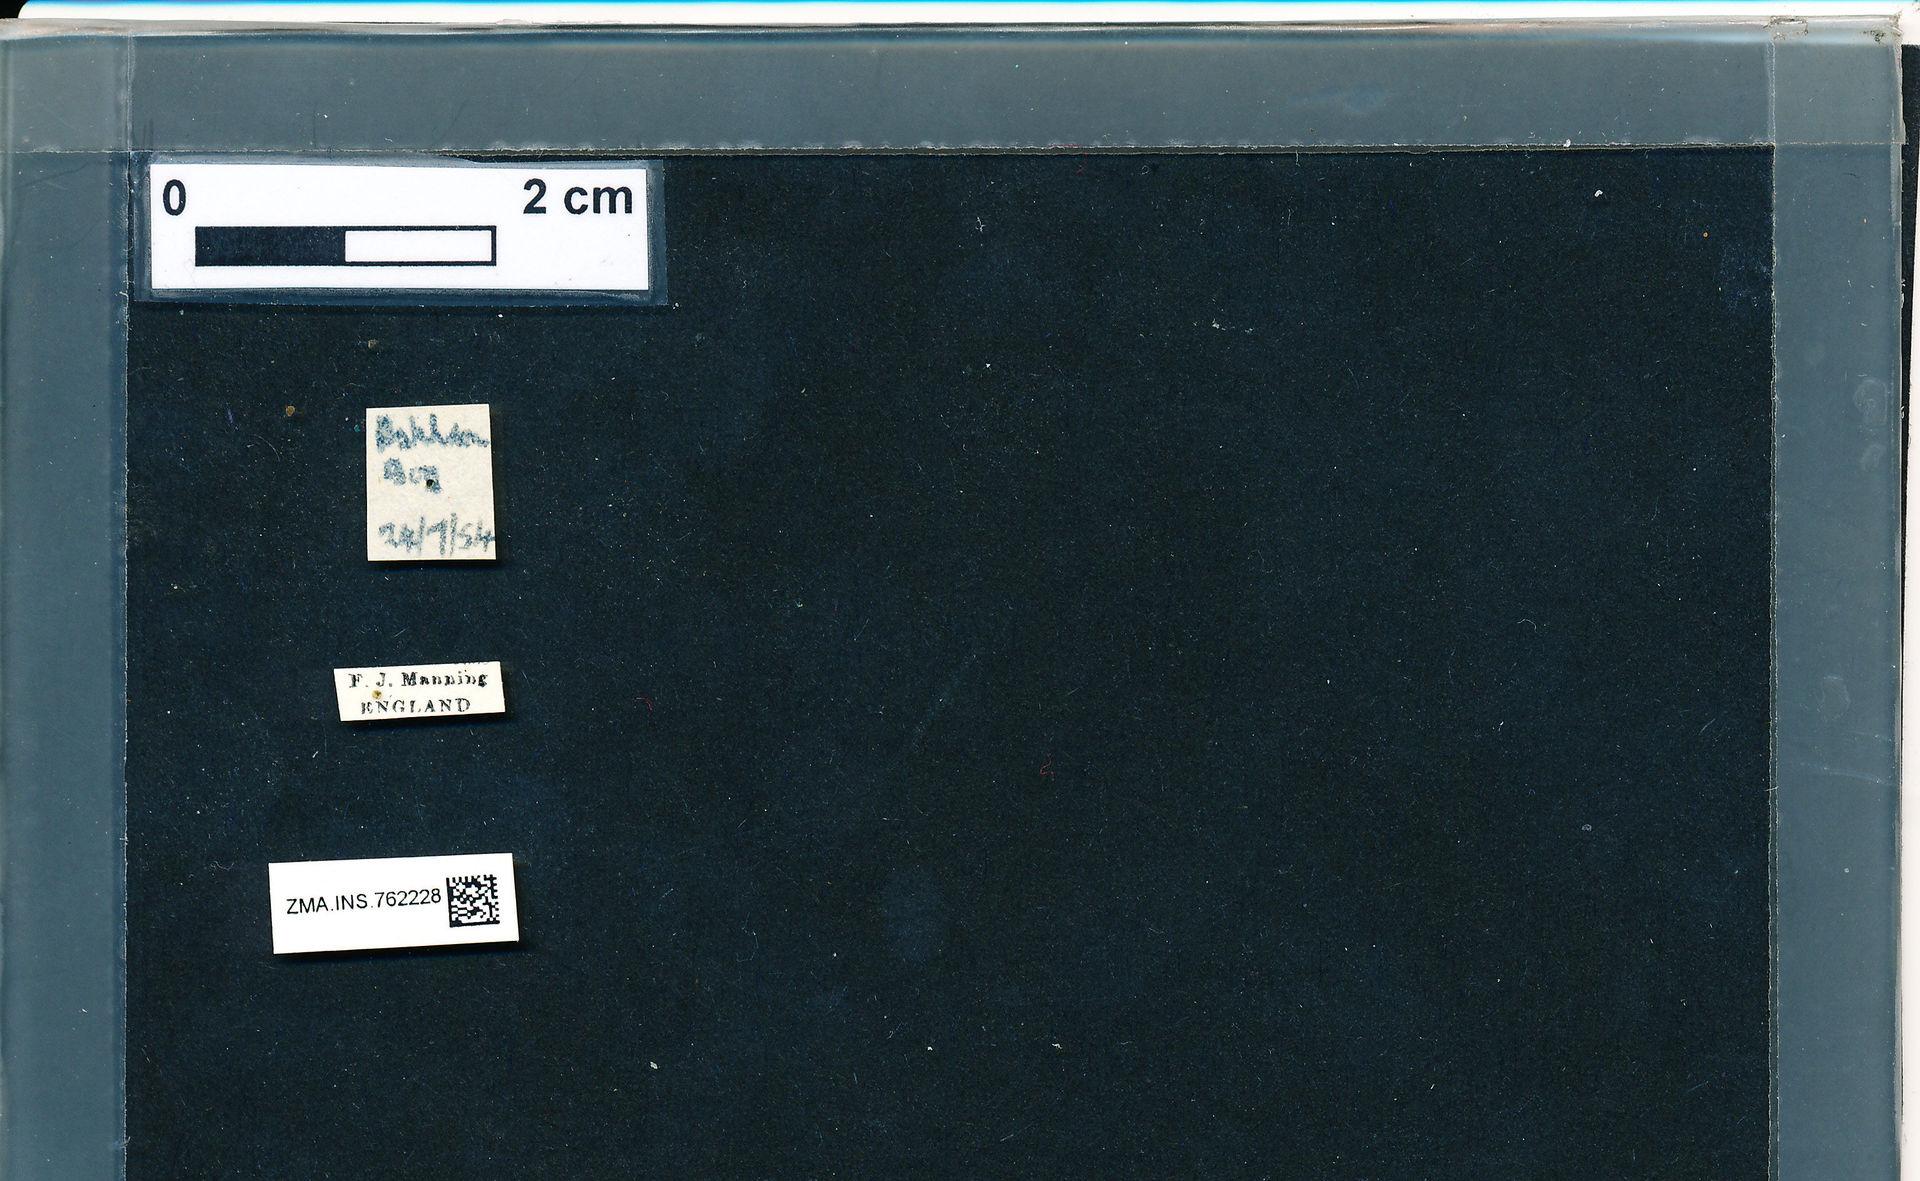 ZMA.INS.762228 | Bombus (Pyrobombus) pratorum pratorum Linnaeus, 1761